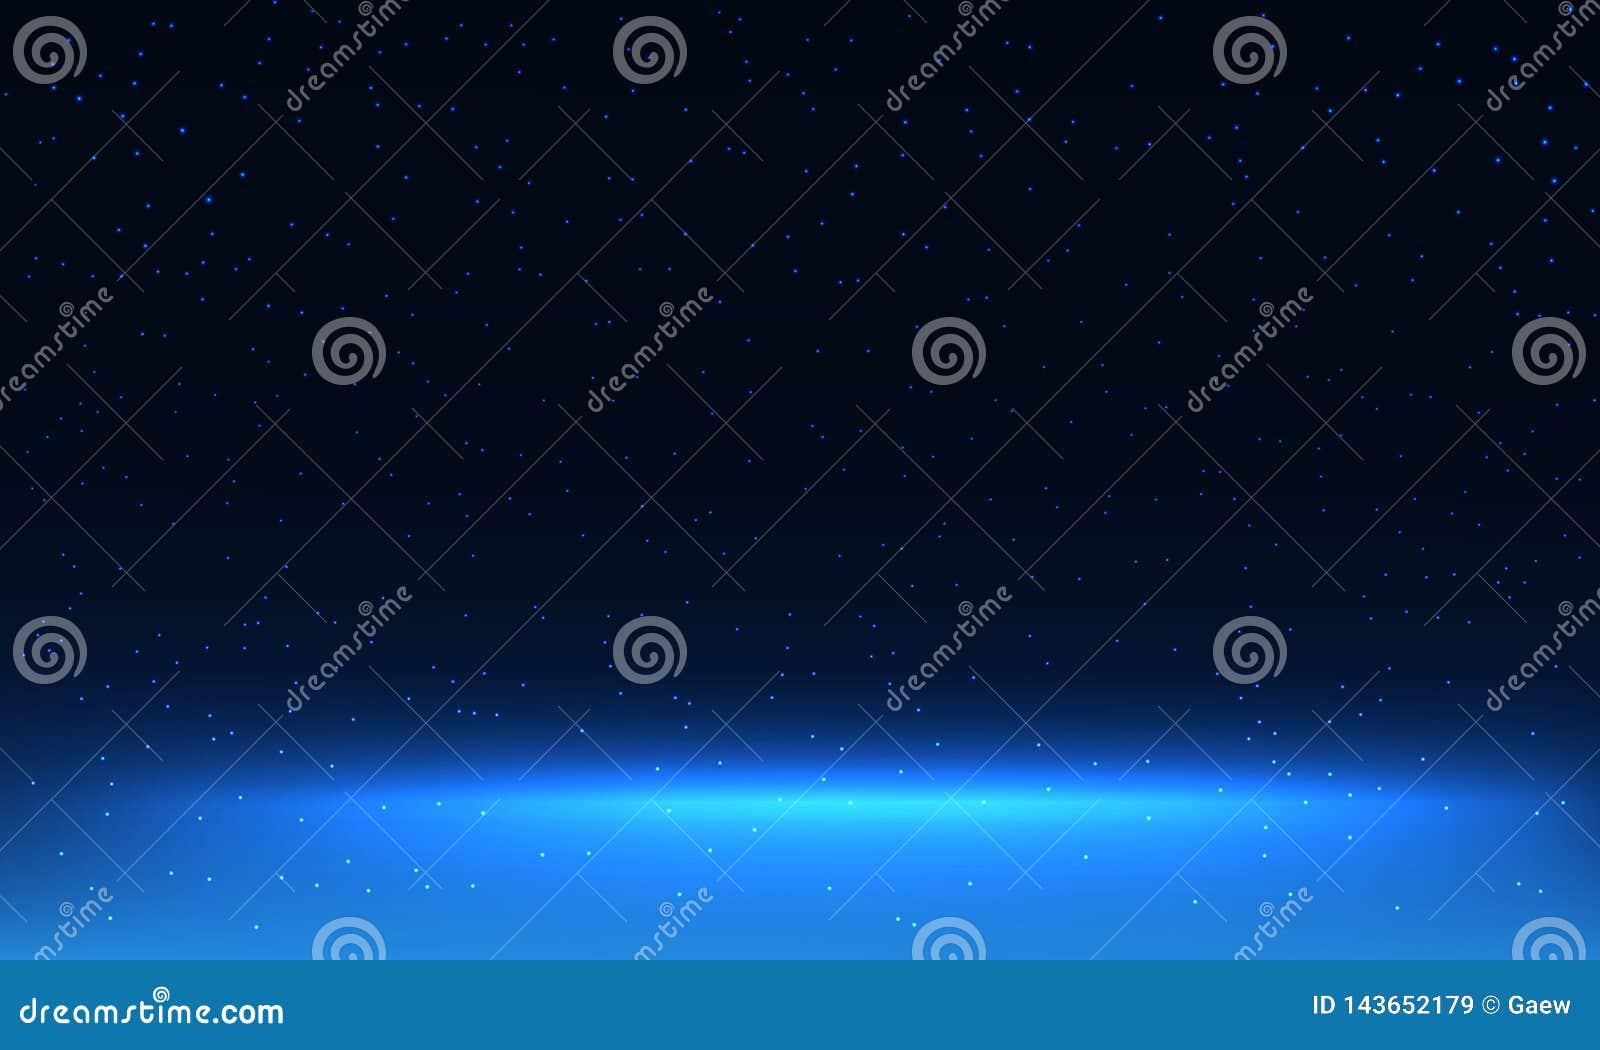 Dark sky with shining stars and Horizon on galaxy